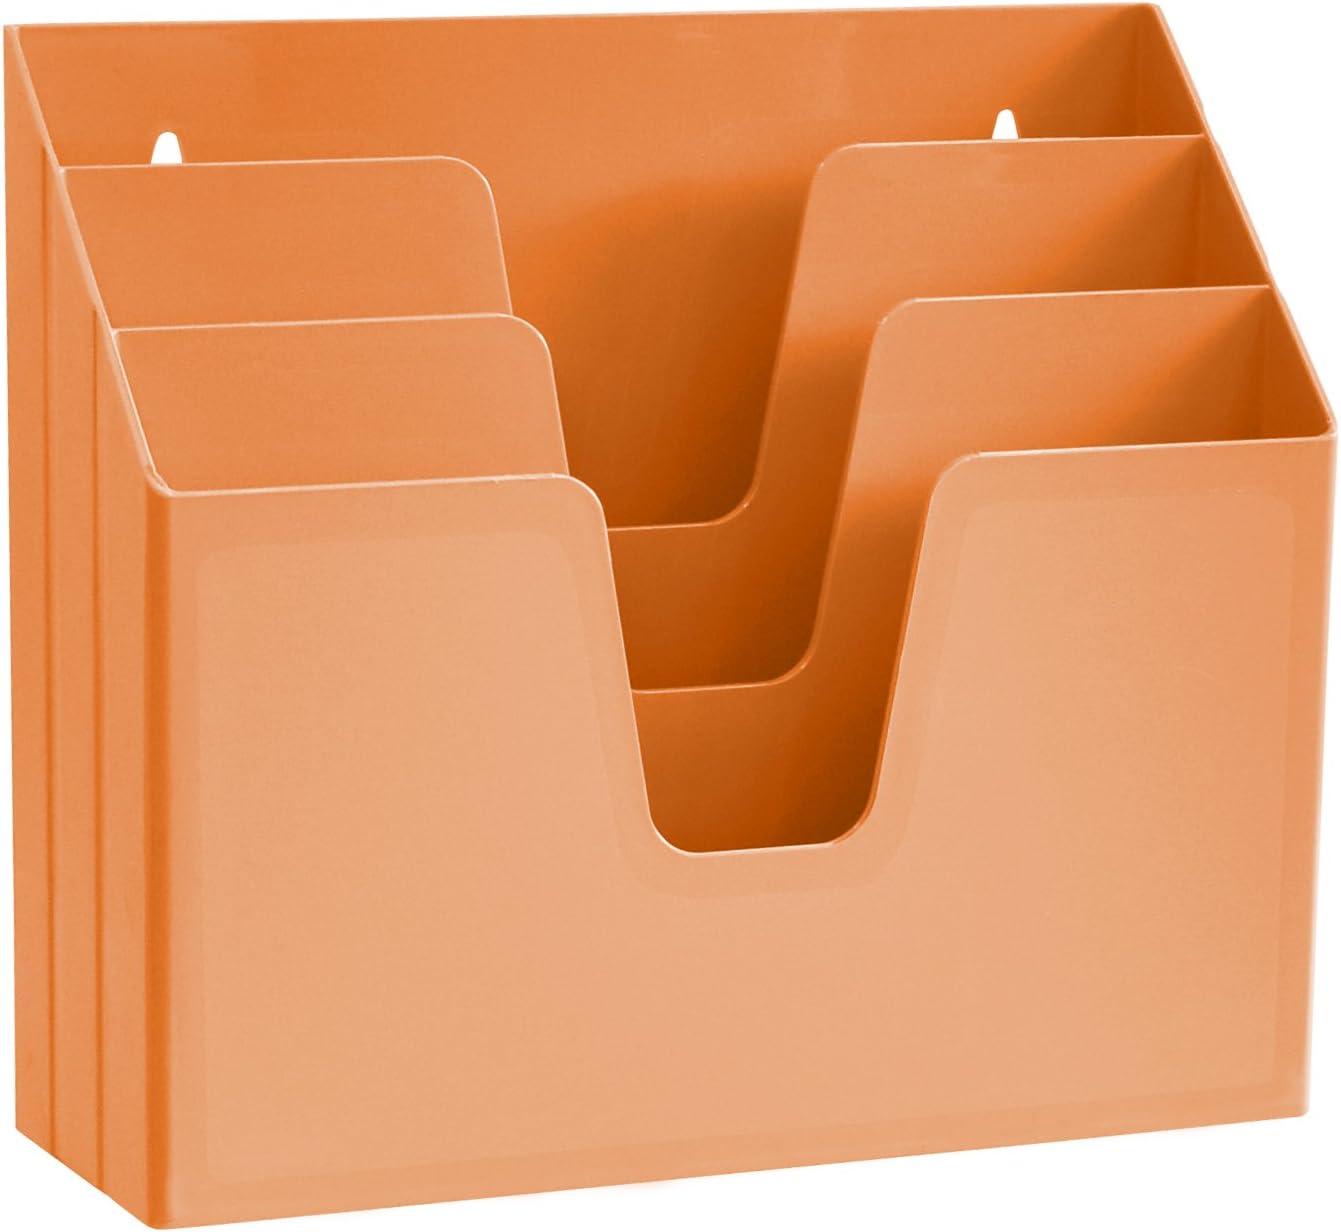 Acrimet Horizontal Triple File Folder Organizer (Orange Citrus Color)